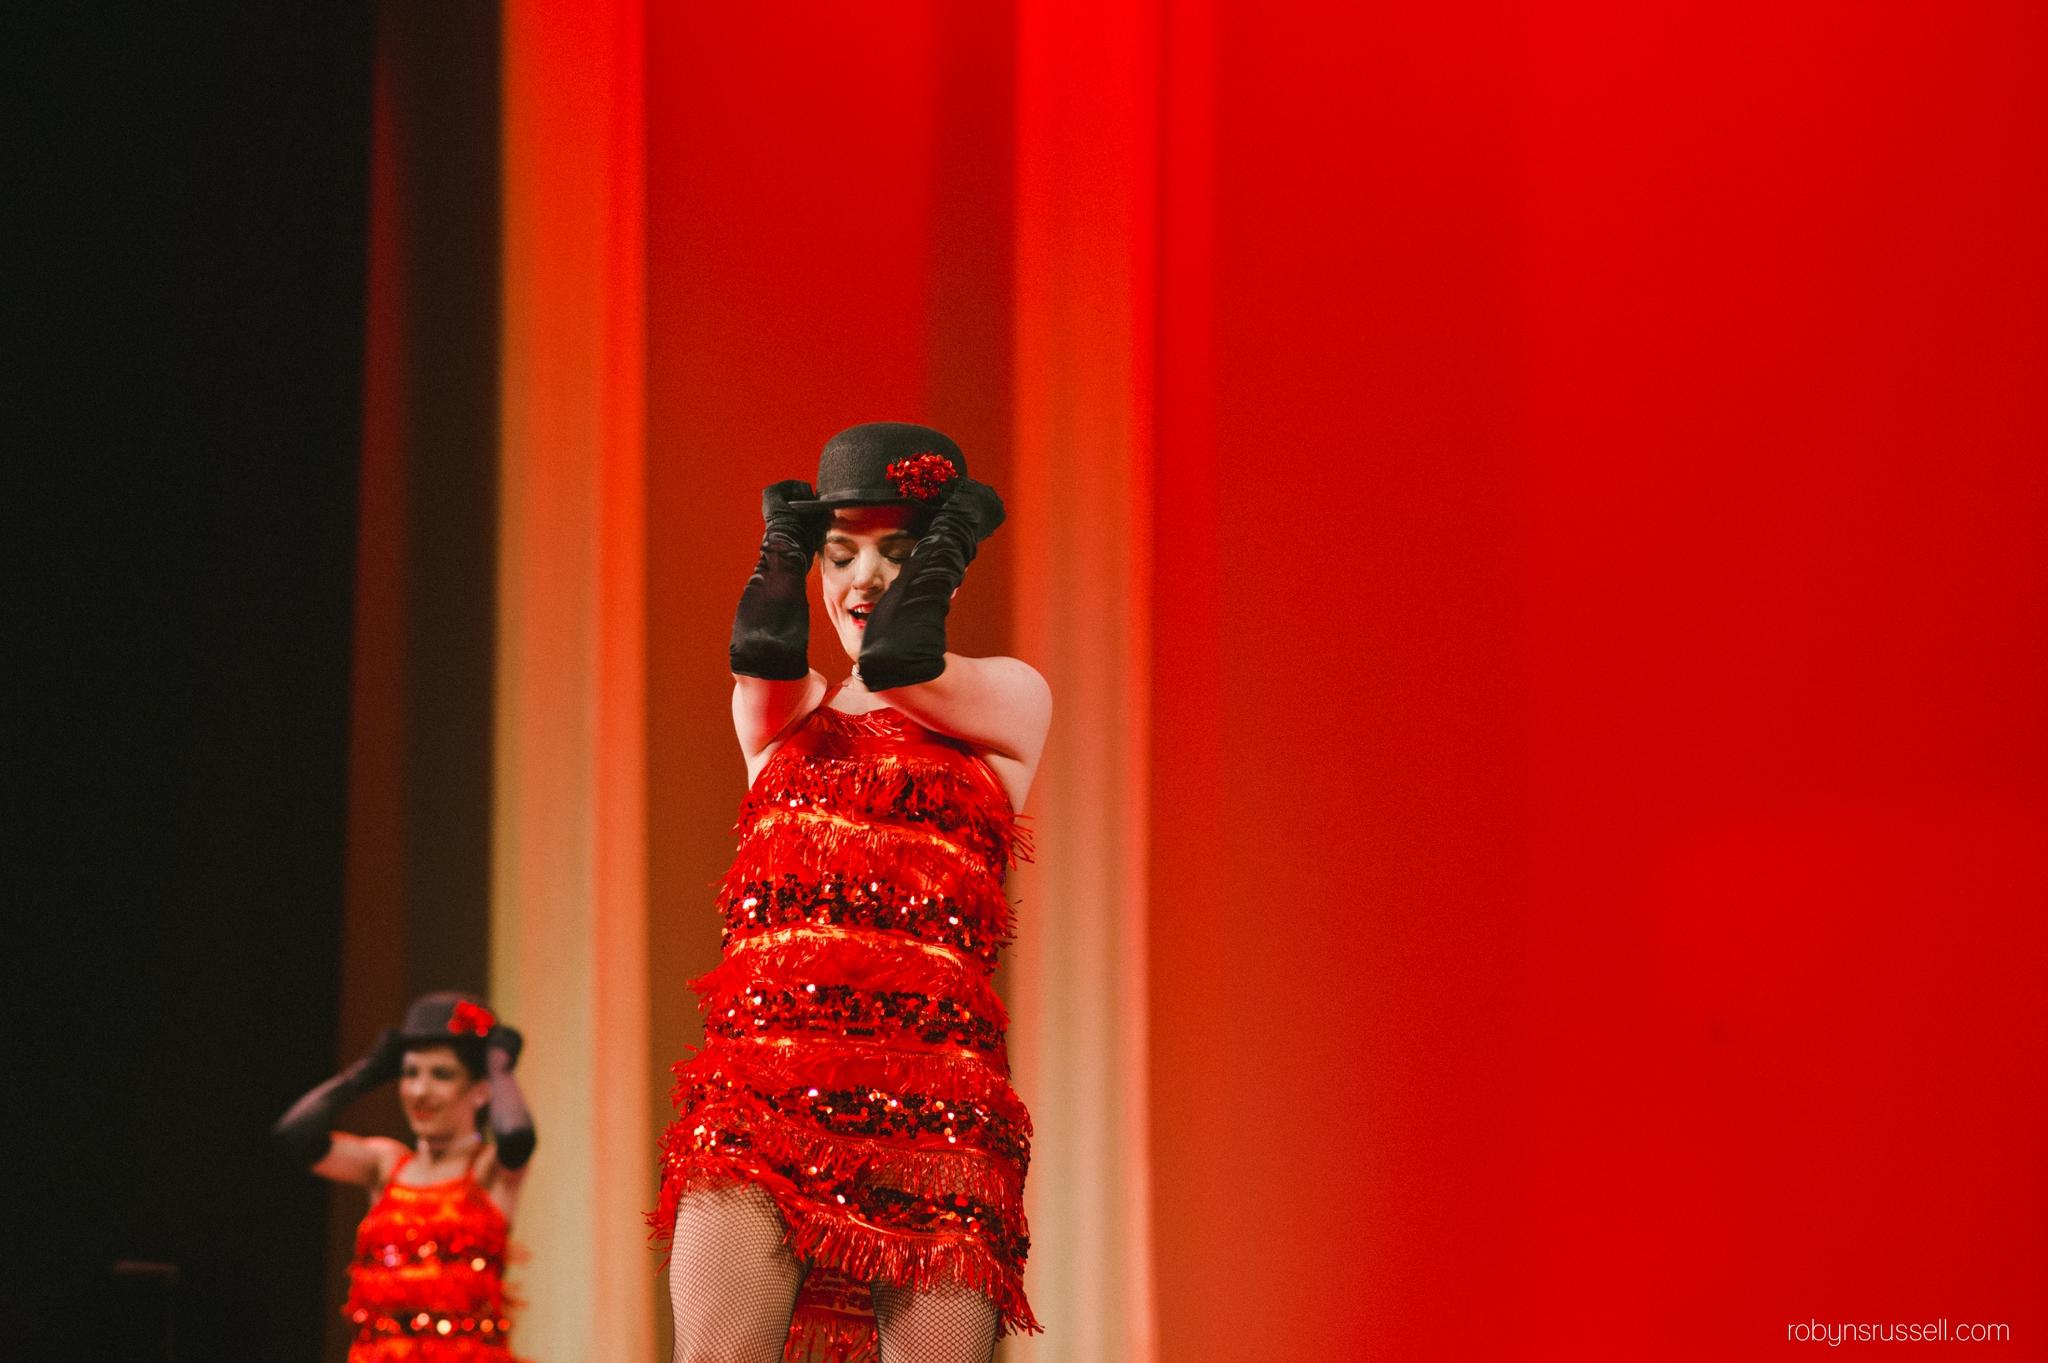 12-amazing-cabaret-dancers-burlington-dance-photographer.jpg